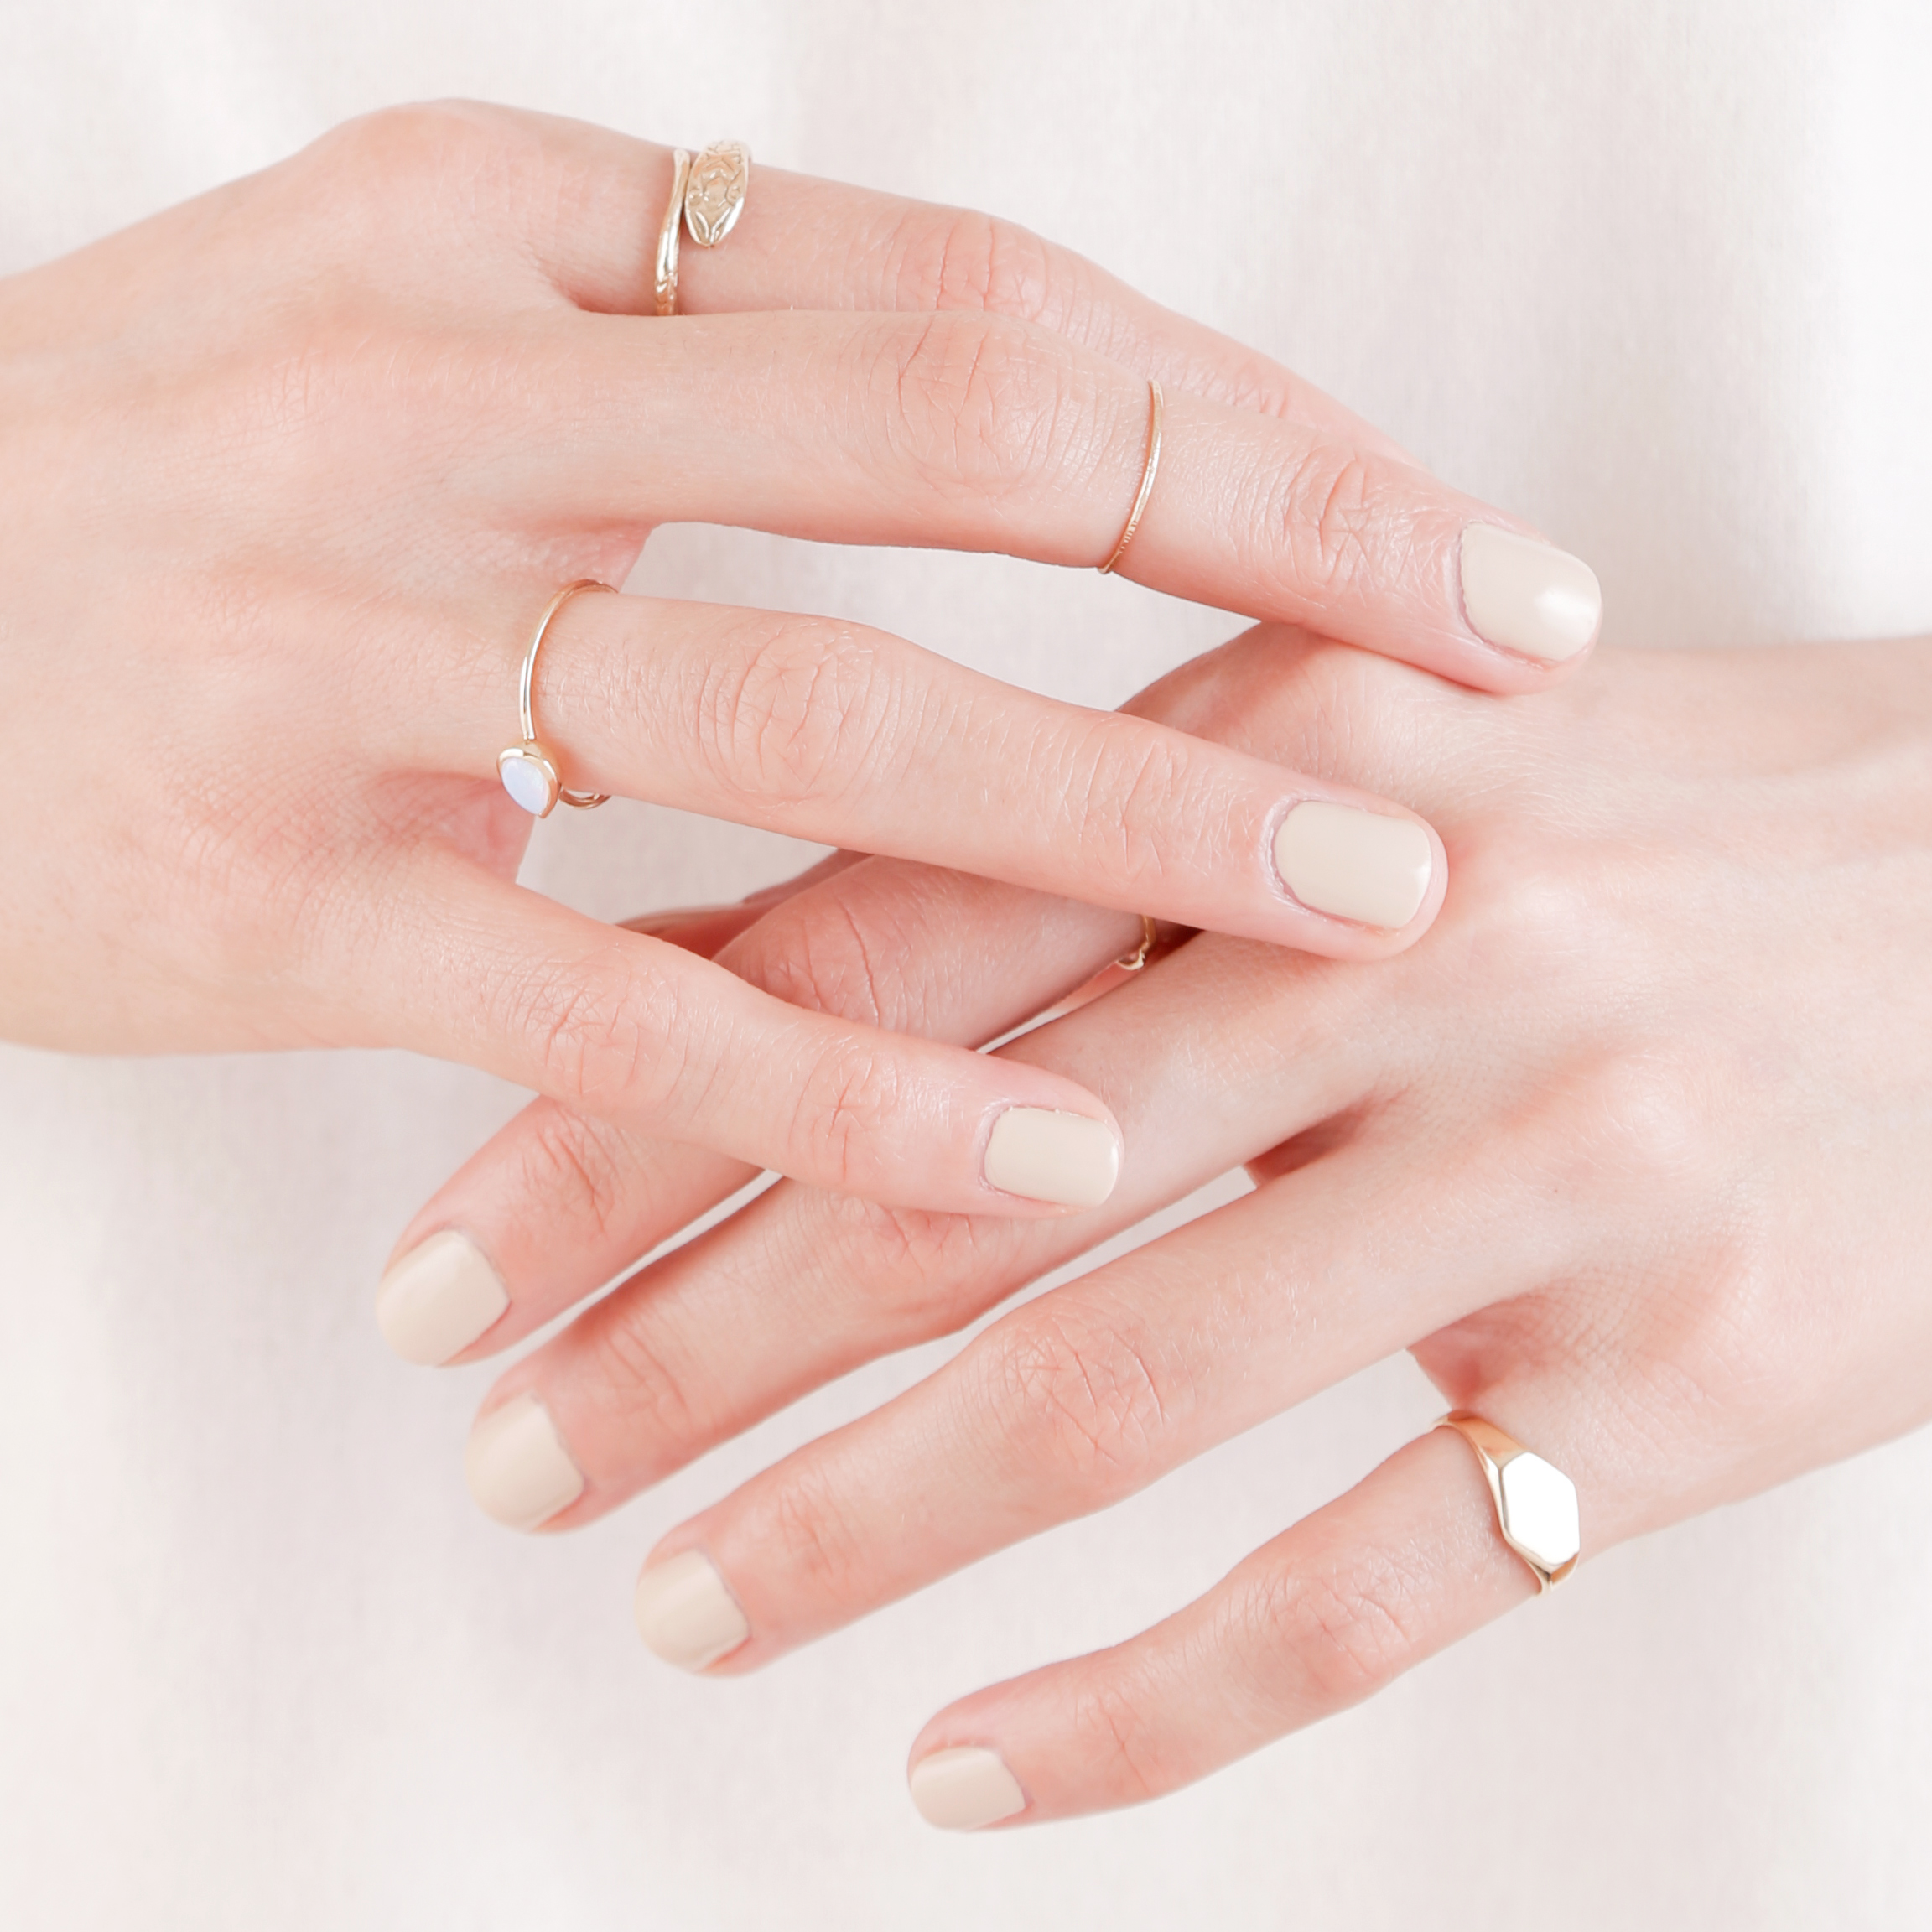 Jewelry hand Image 3